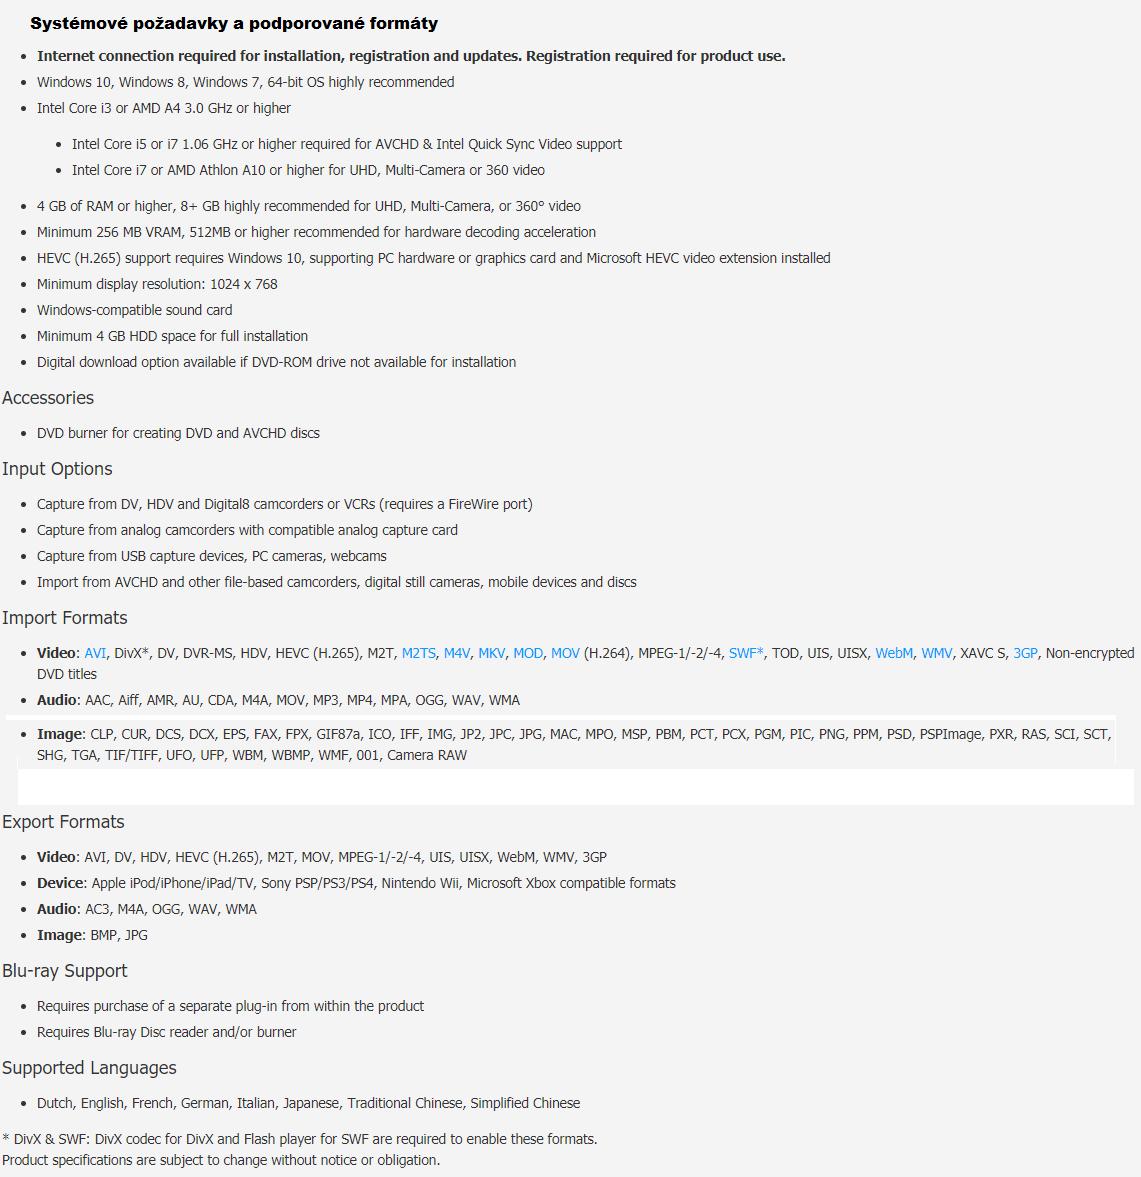 🏆 Corel videostudio ultimate 2018 guide | Corel VideoStudio